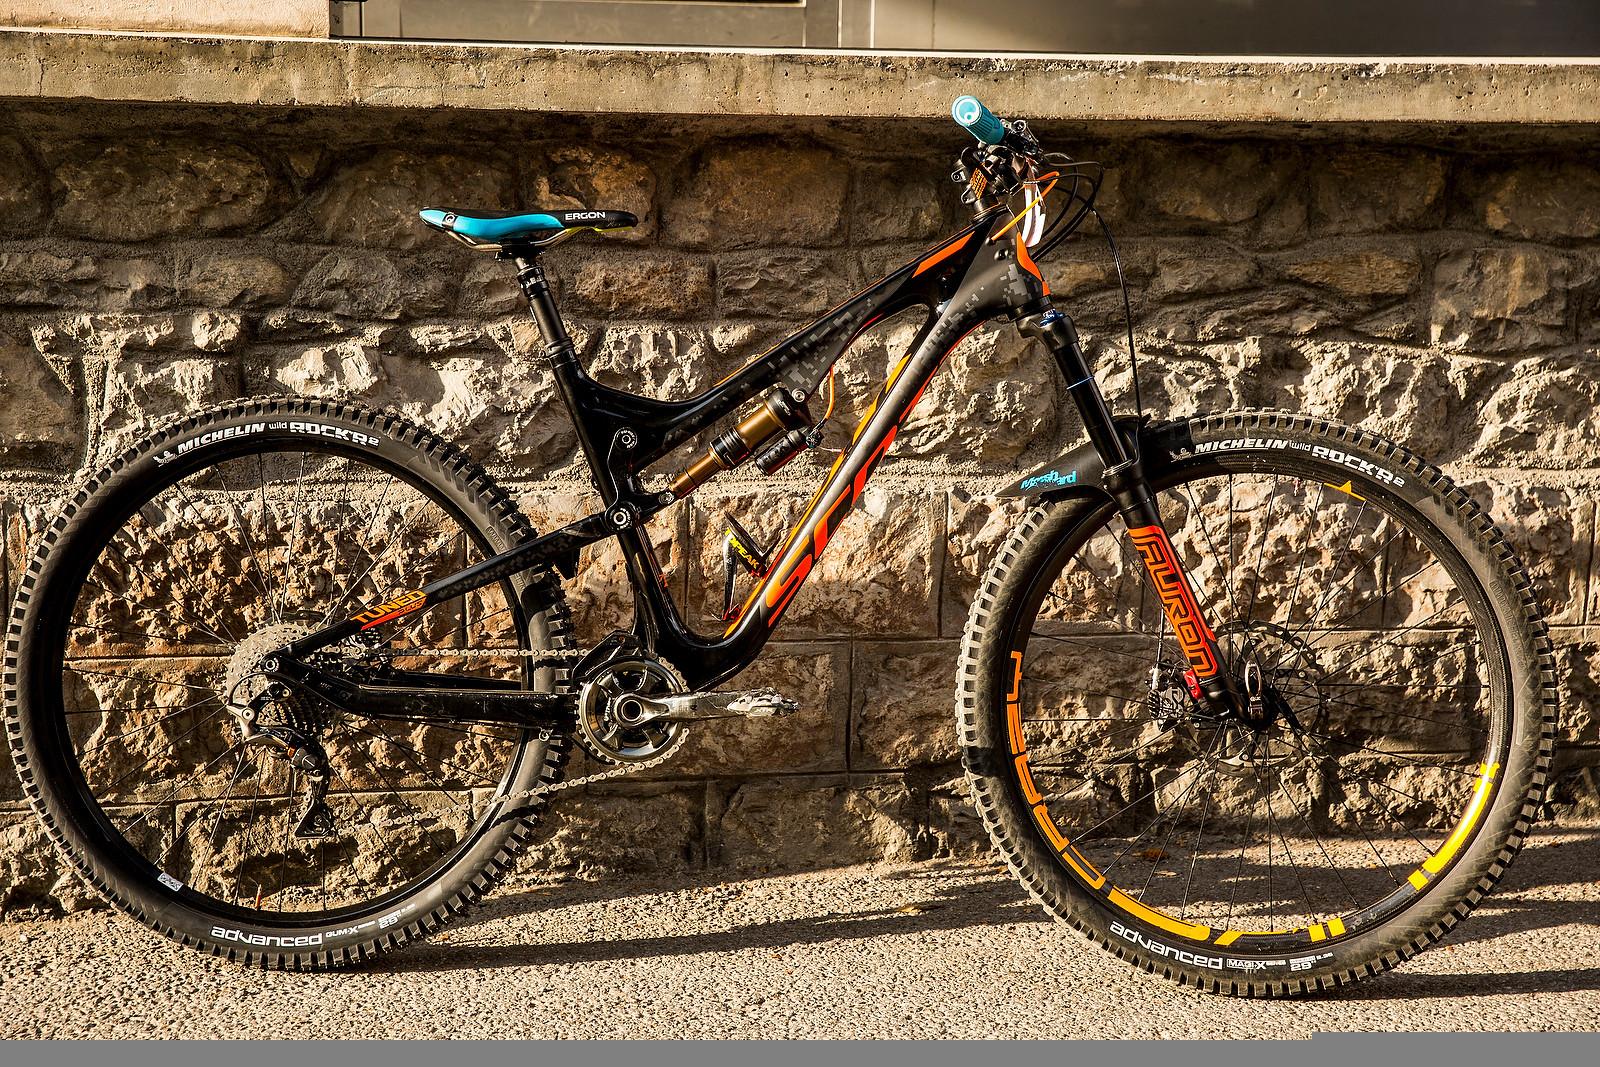 Remy Absalon's Scott Genius LT 27.5 Plus with 29-inch Wheels - PIT BITS - Enduro World Series, Samoens, France - Mountain Biking Pictures - Vital MTB